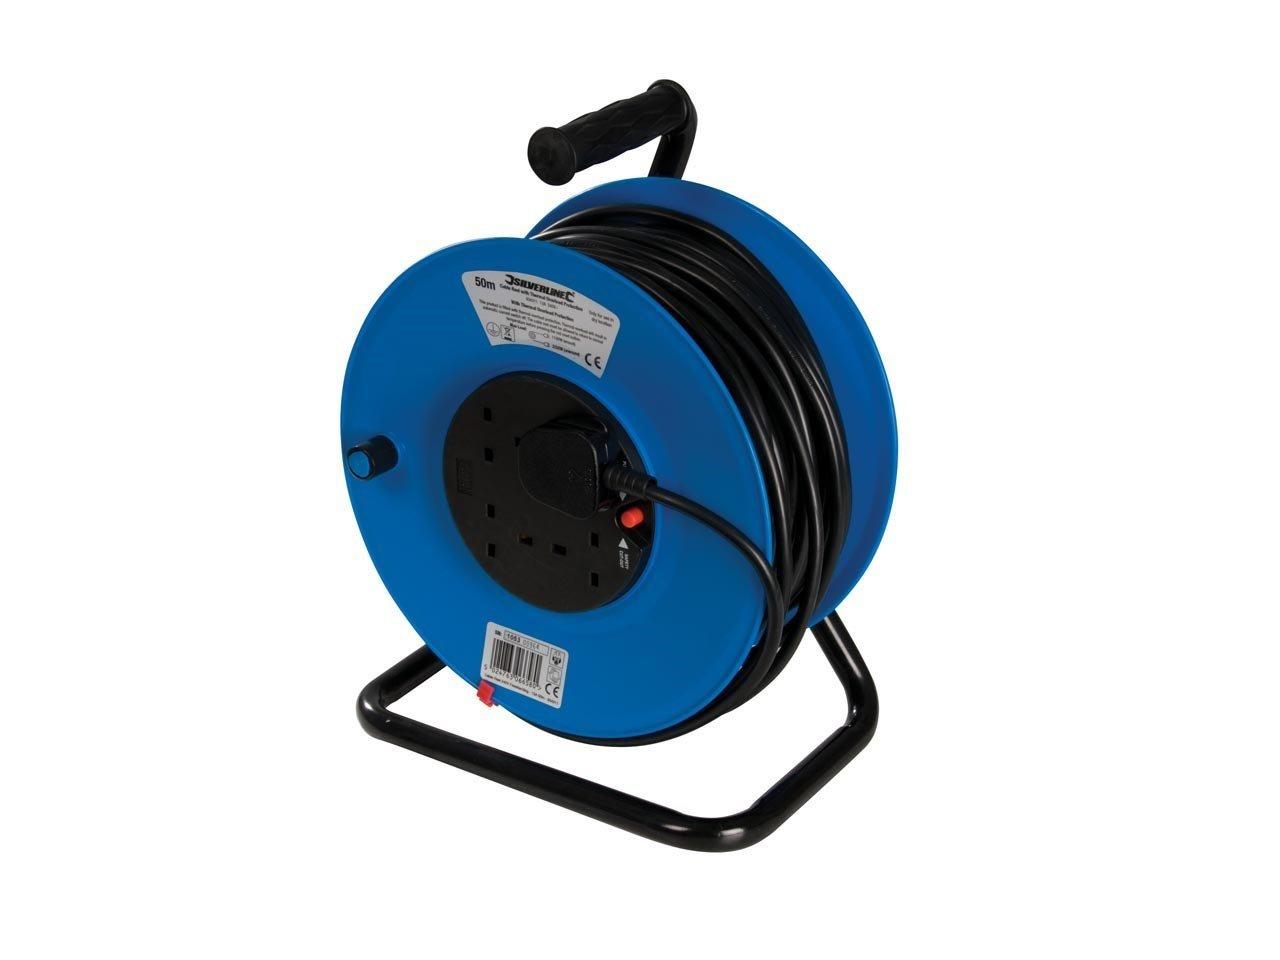 Power Master Cable Reel 240V Freestanding 13A 50m 4 Socket